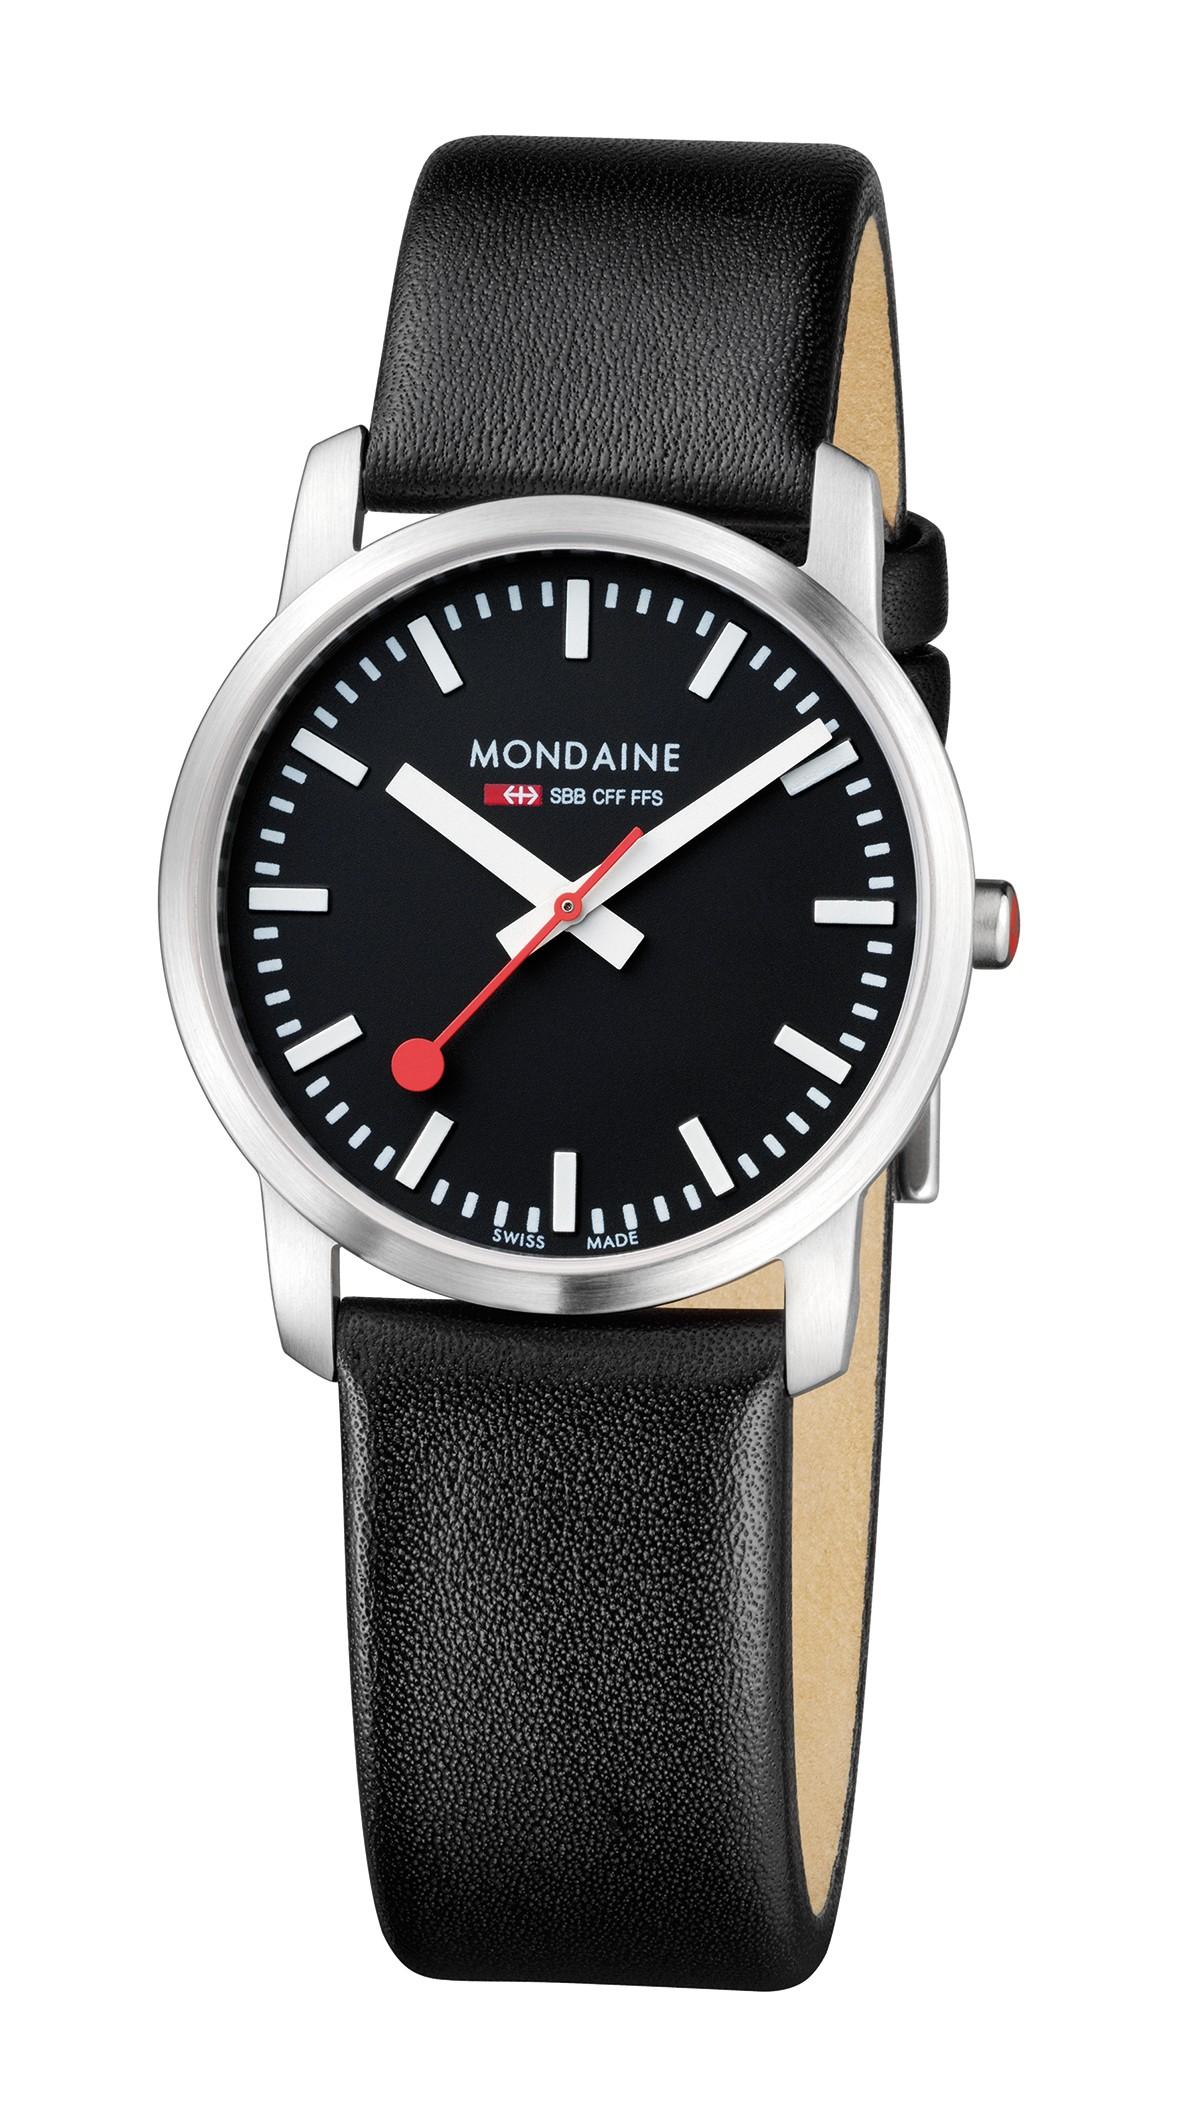 Mondaine swiss watch SIMPLY ELEGANT LADIES - A400.30351.14SBB